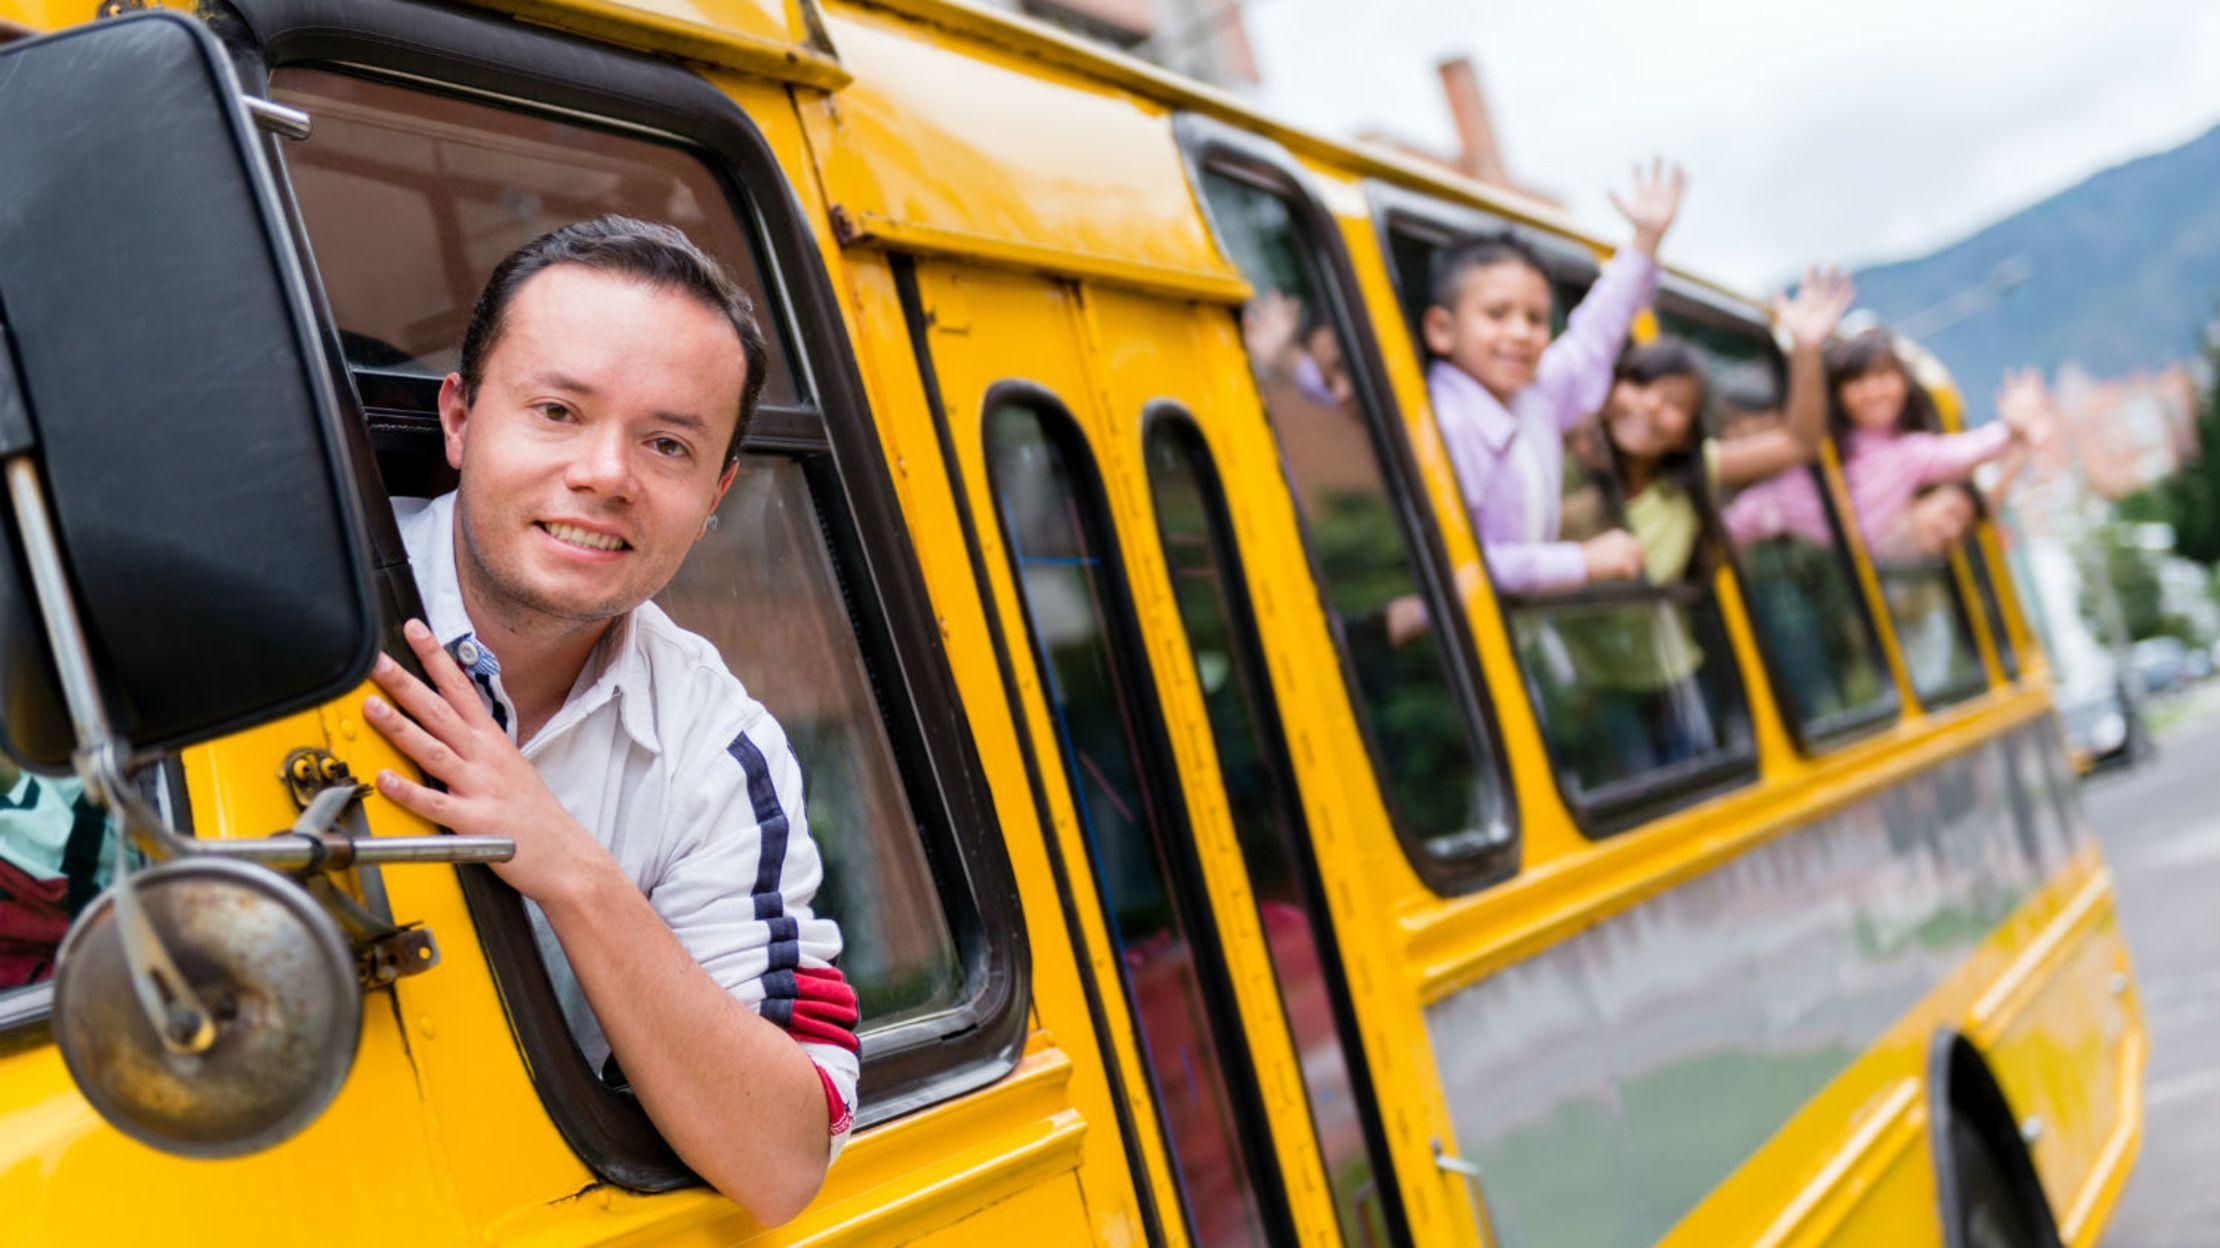 11 Secrets of School Bus Drivers | Mental Floss